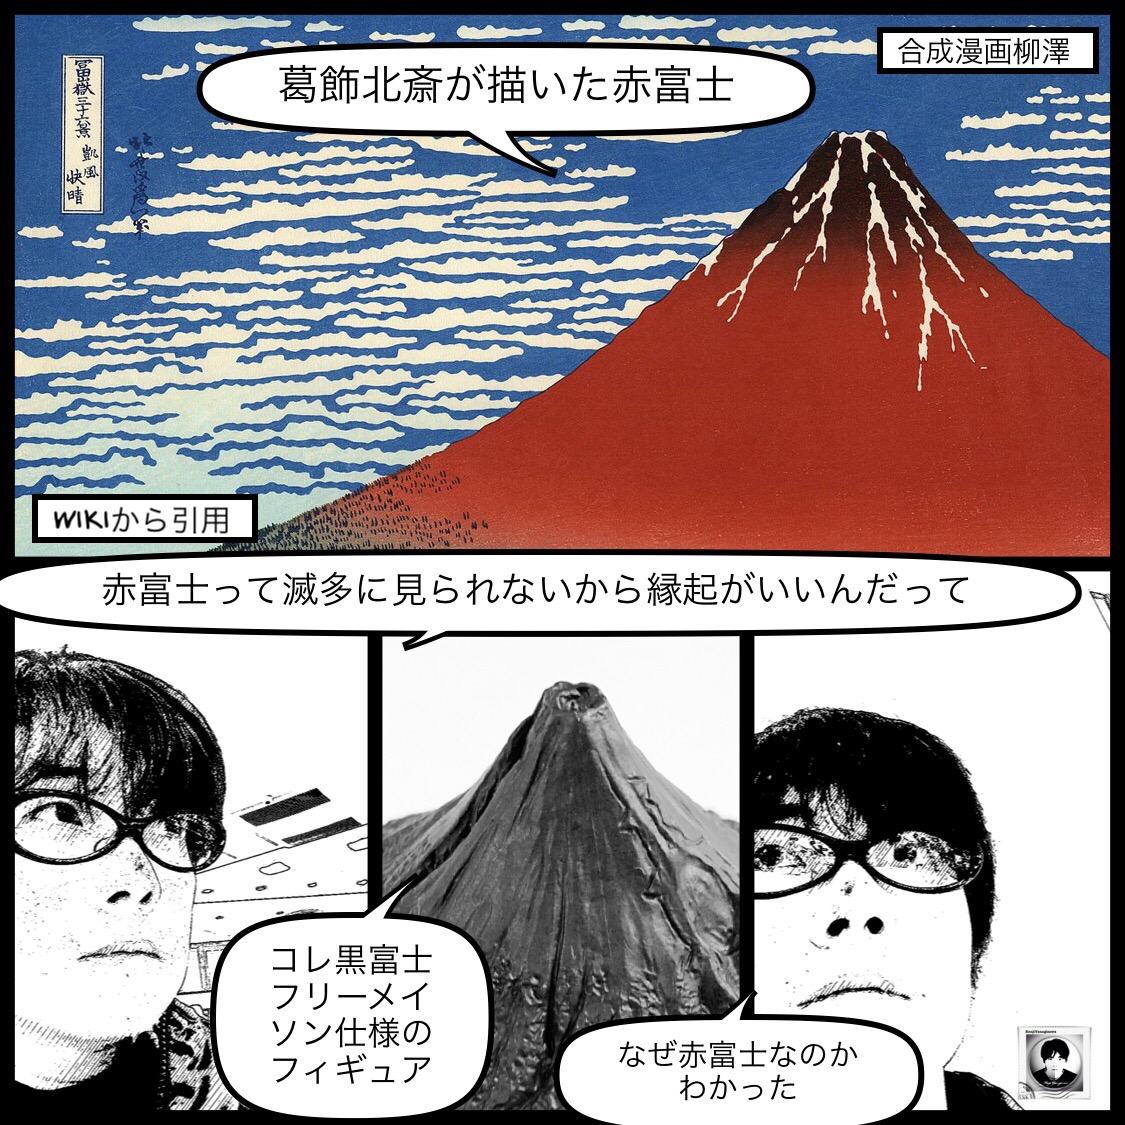 葛飾北斎の赤富士